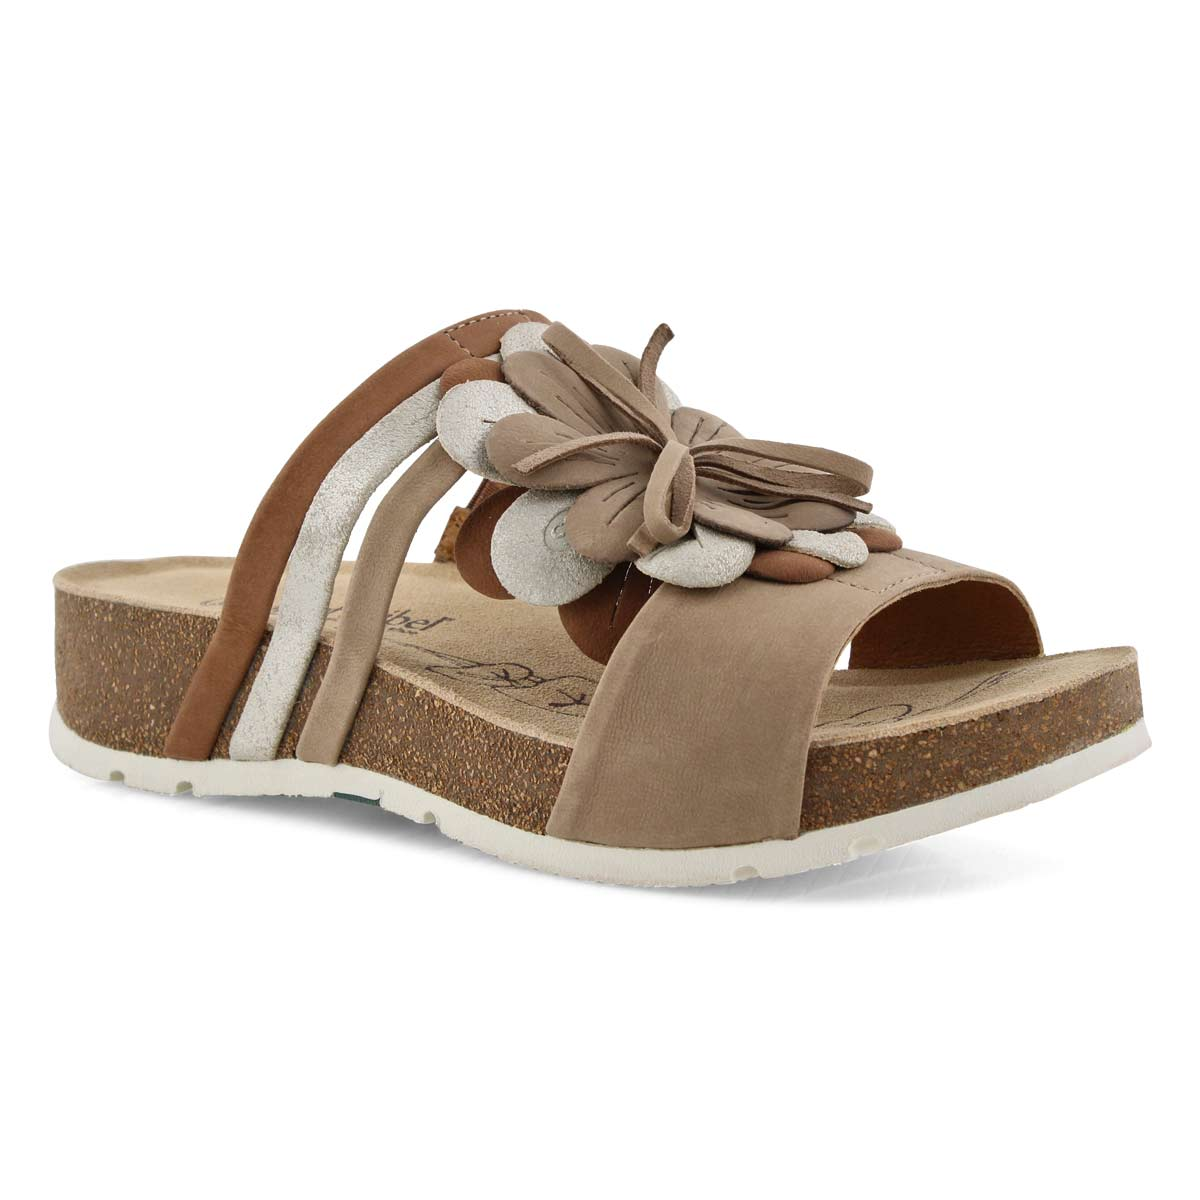 Lds Tilda 10 sand multi slide sandal